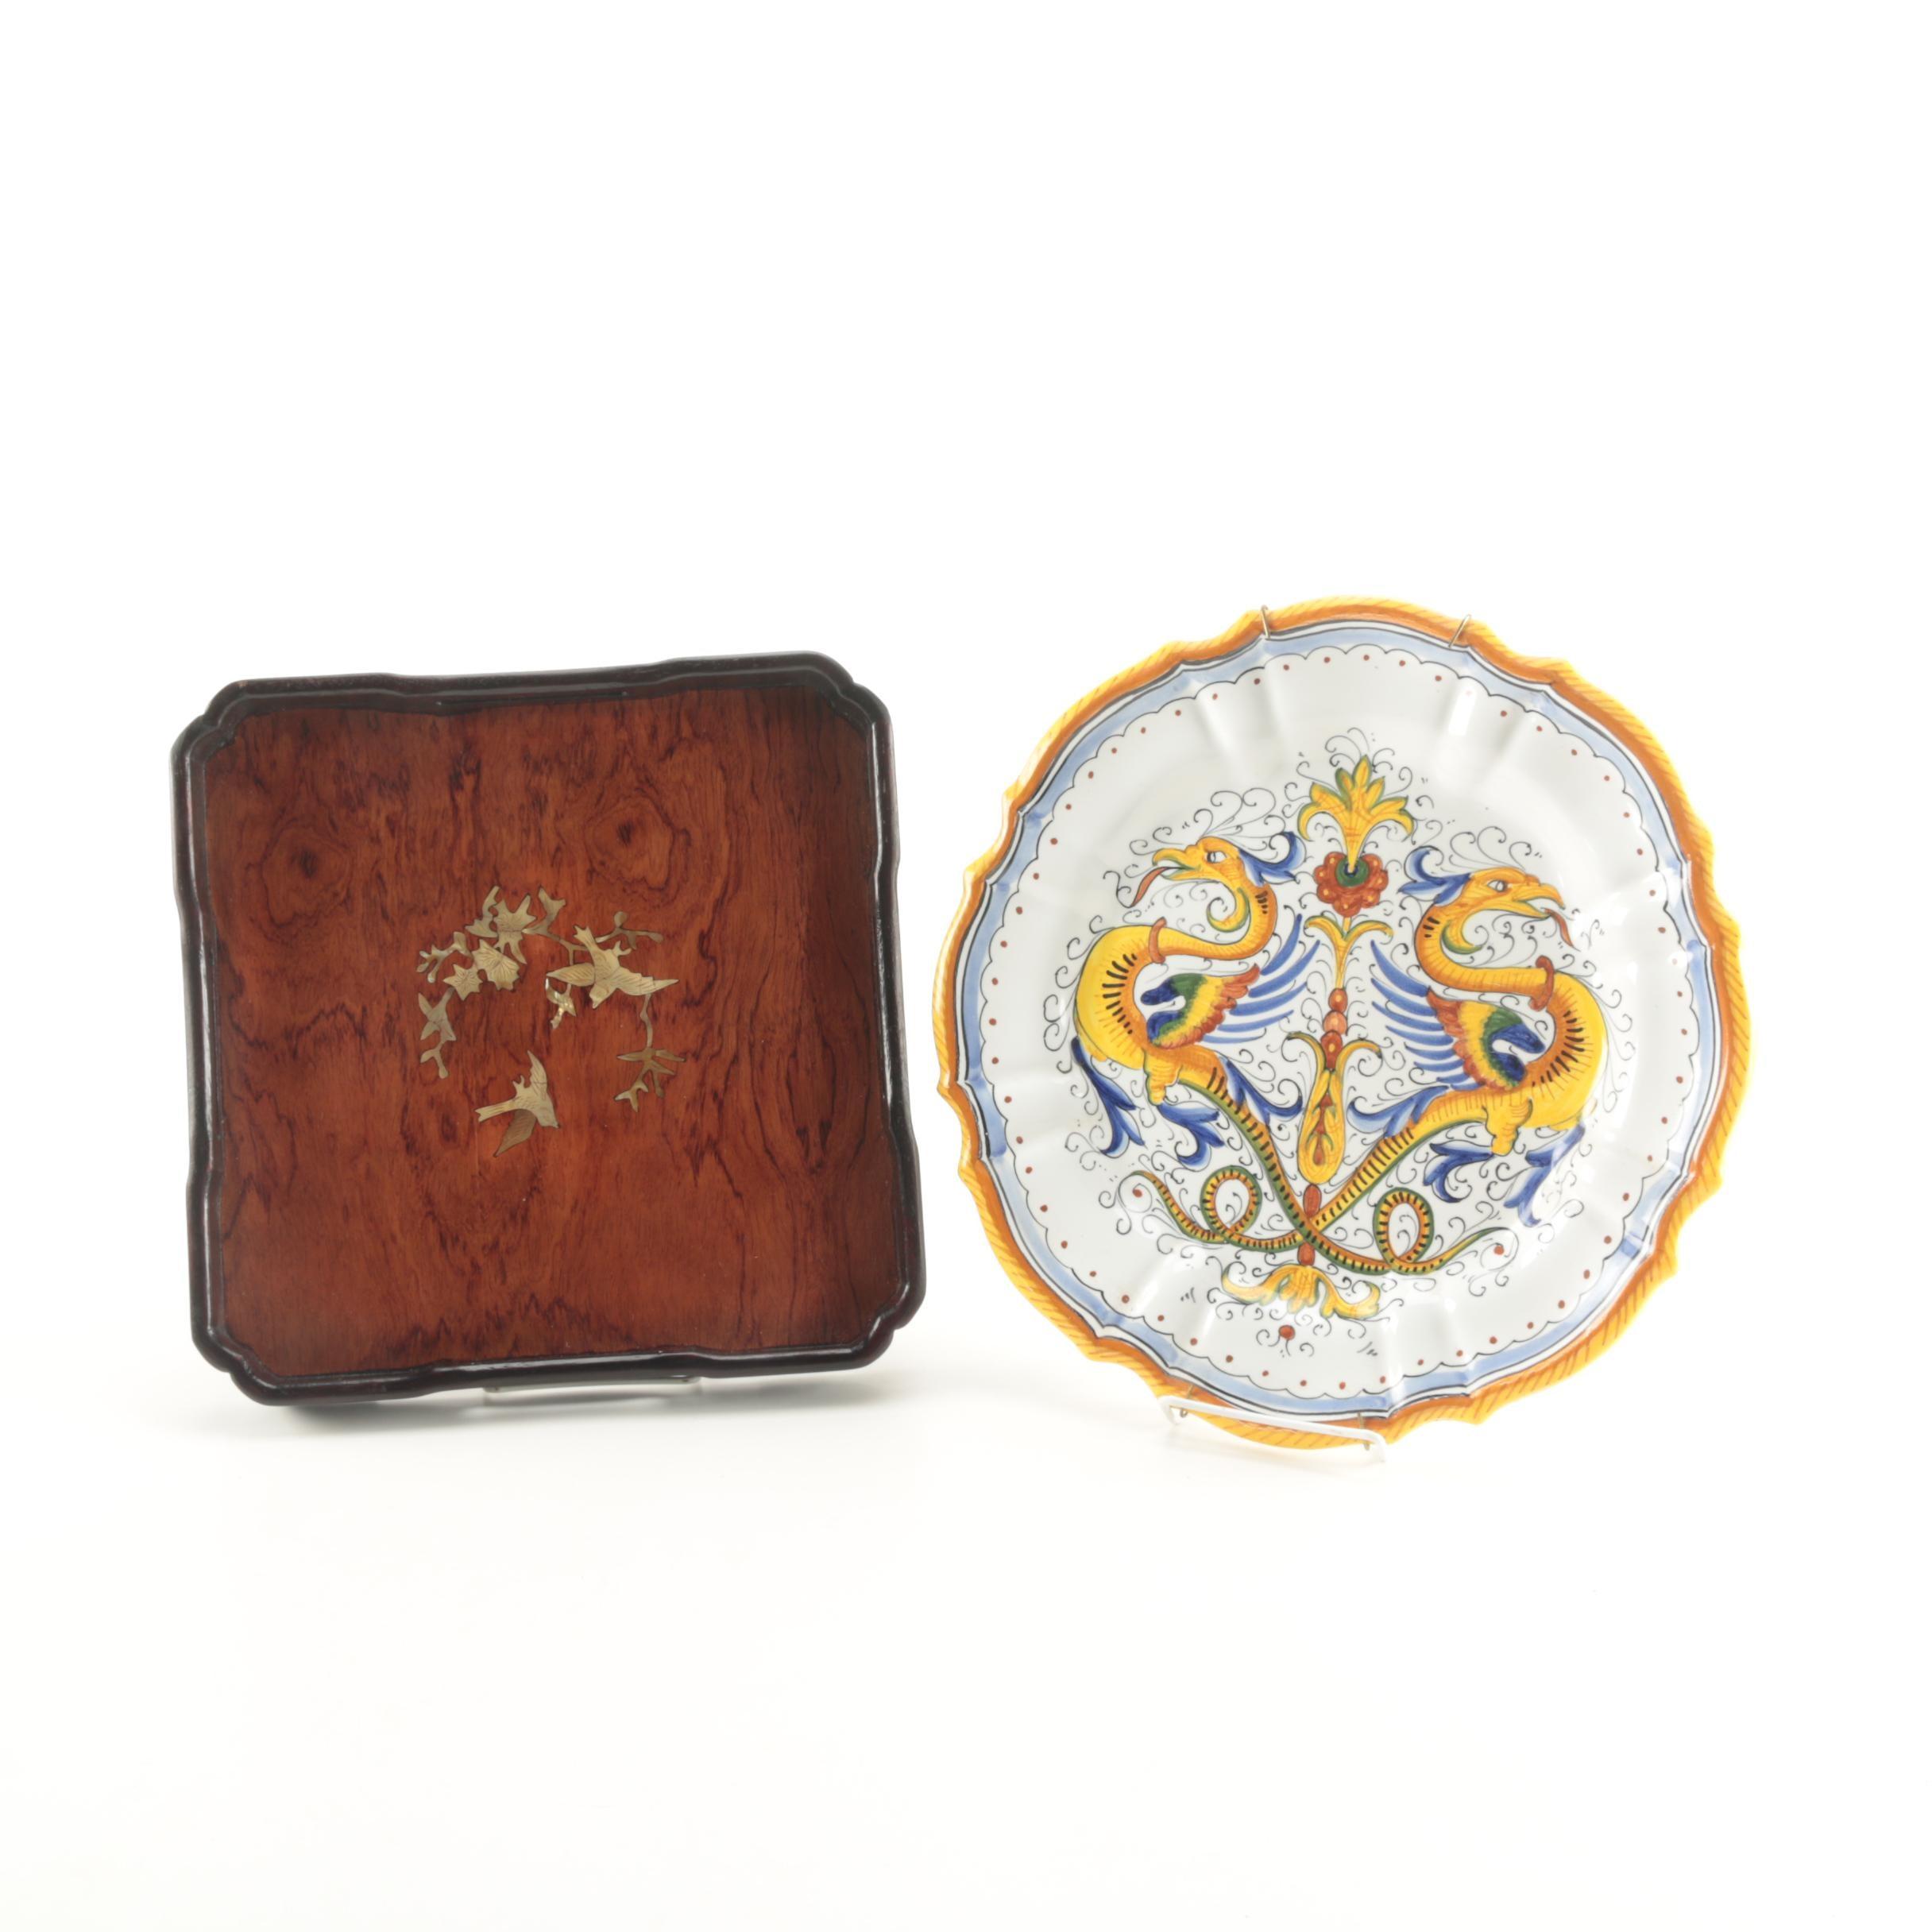 Pair of Decorative Plates Including Deruta